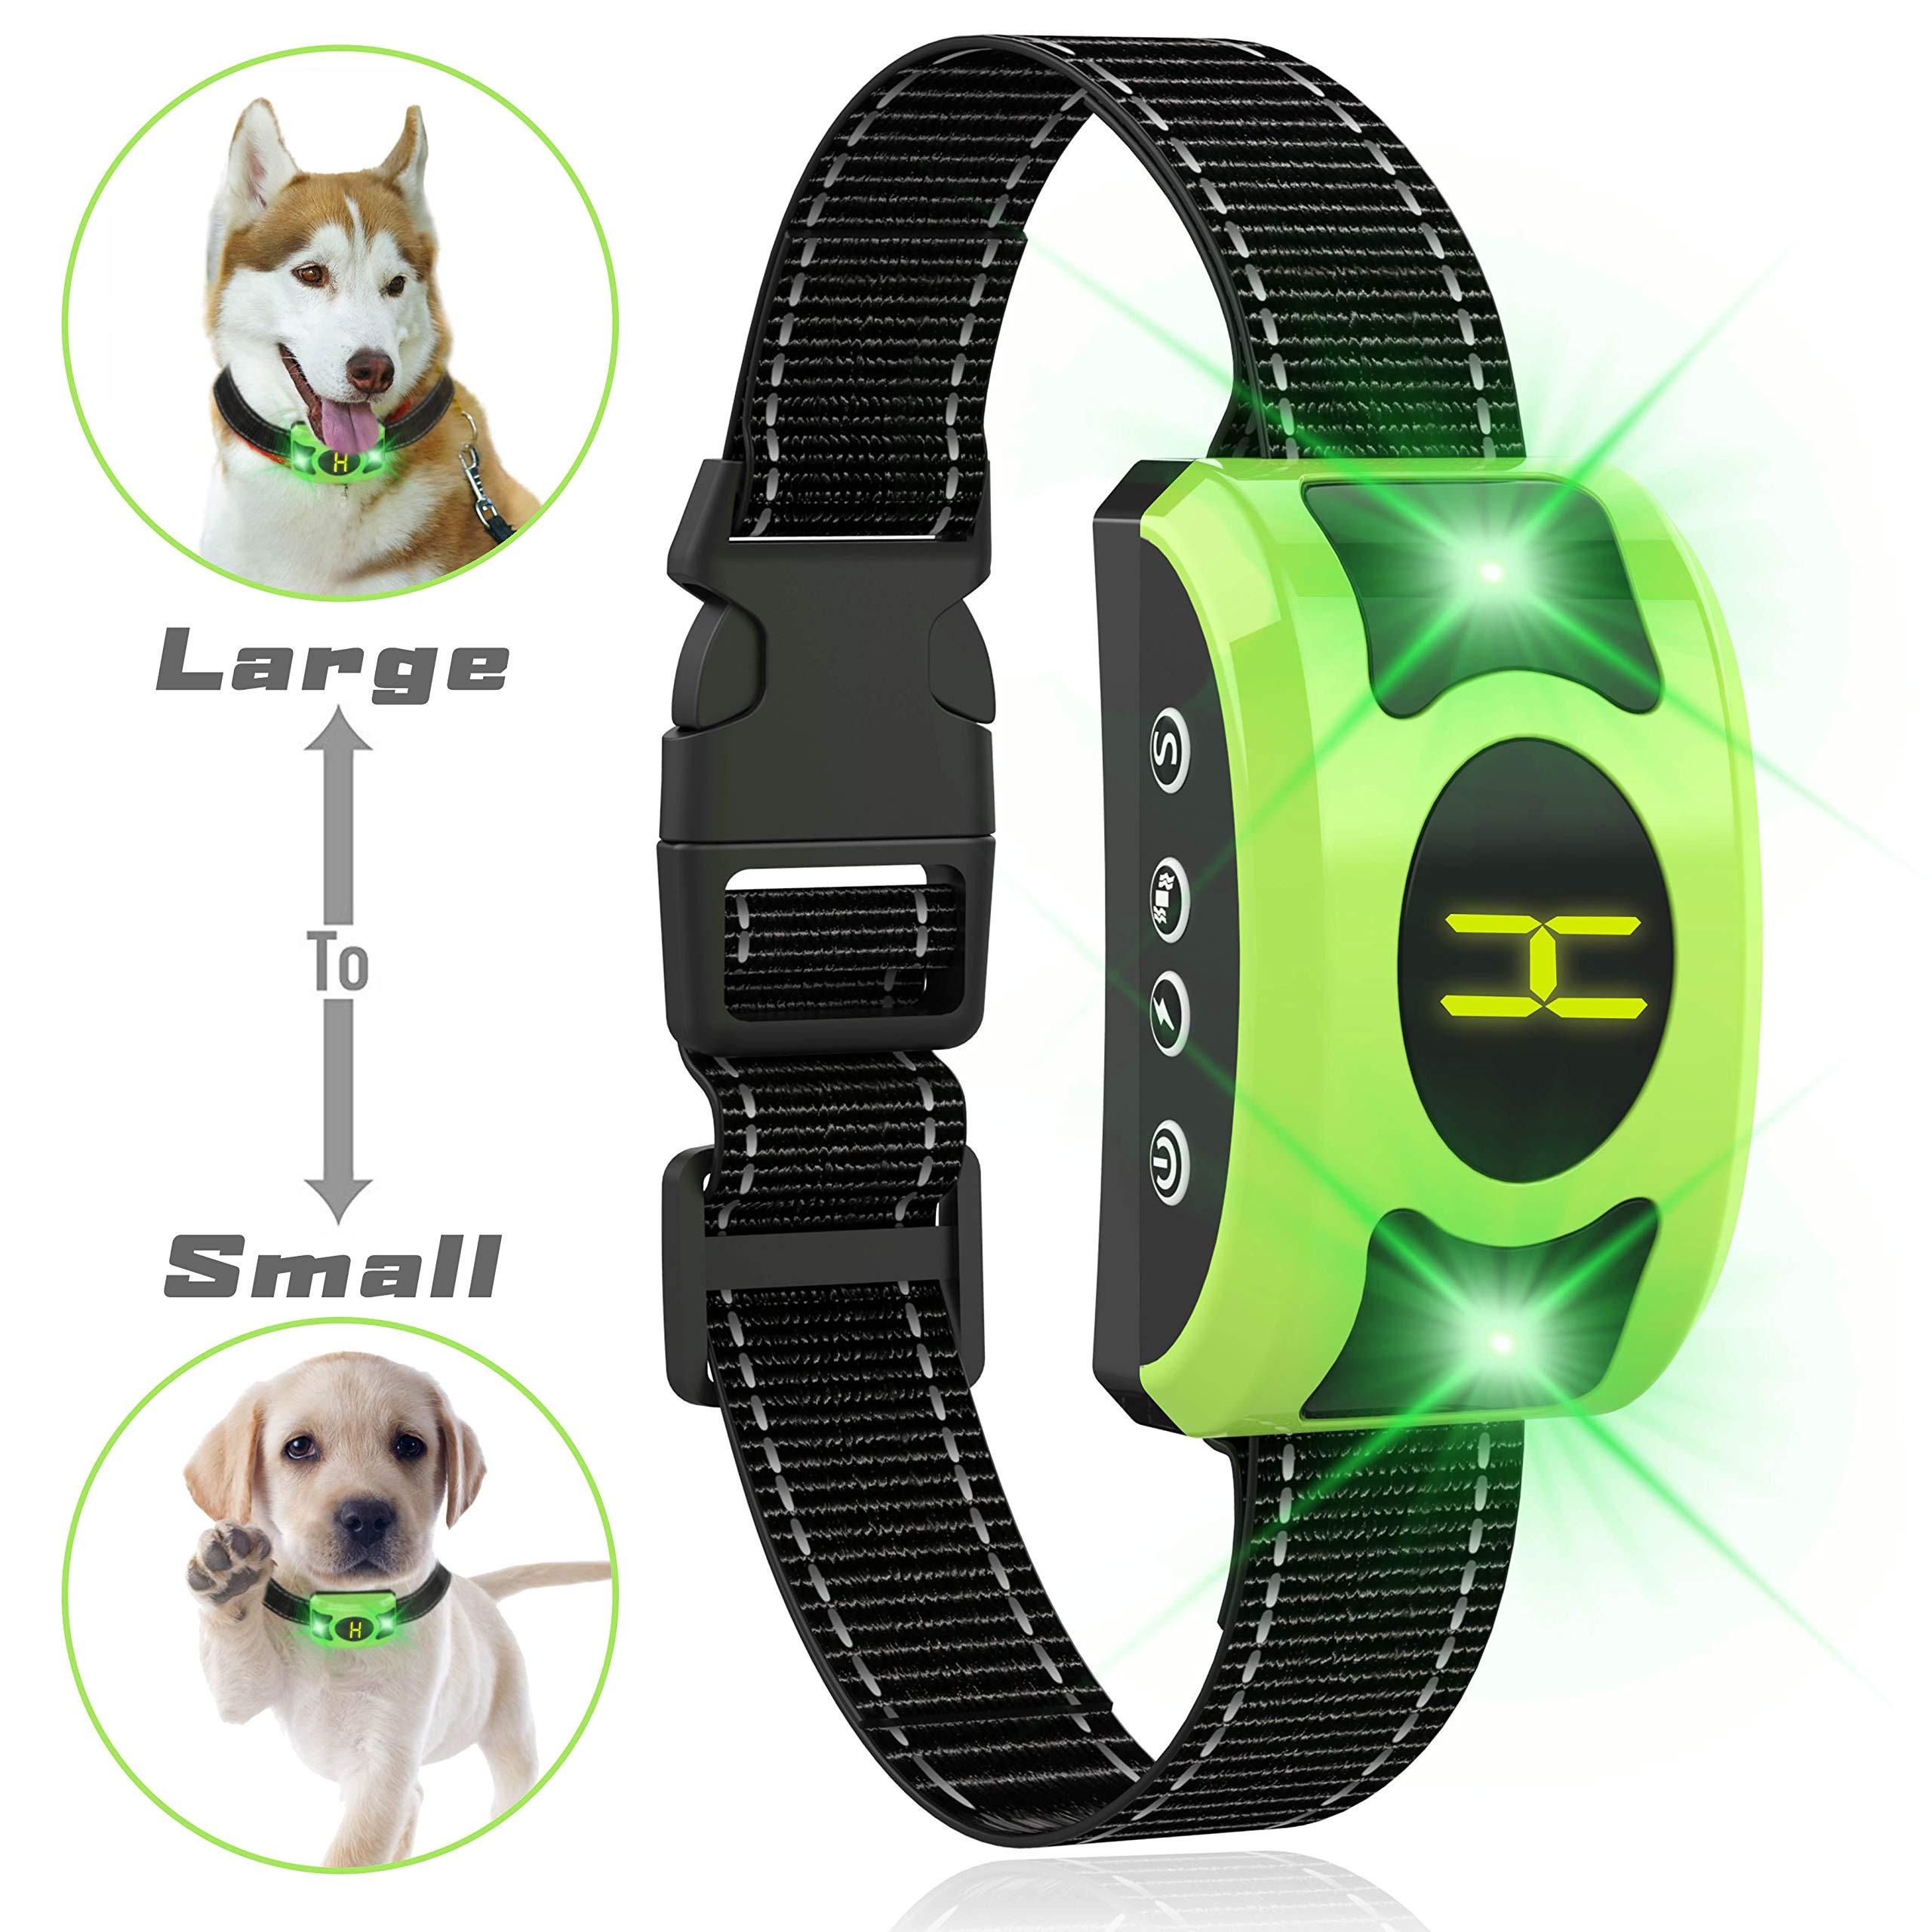 ValoinUS Dog Bark Collar Adjustable Sensitivity and Intensity Levels-Dual Anti-Barking Modes-Rechargeable/Rainproof -No Barking Control Dog Shock Collar for Small Medium Large Dog by ValoinUS